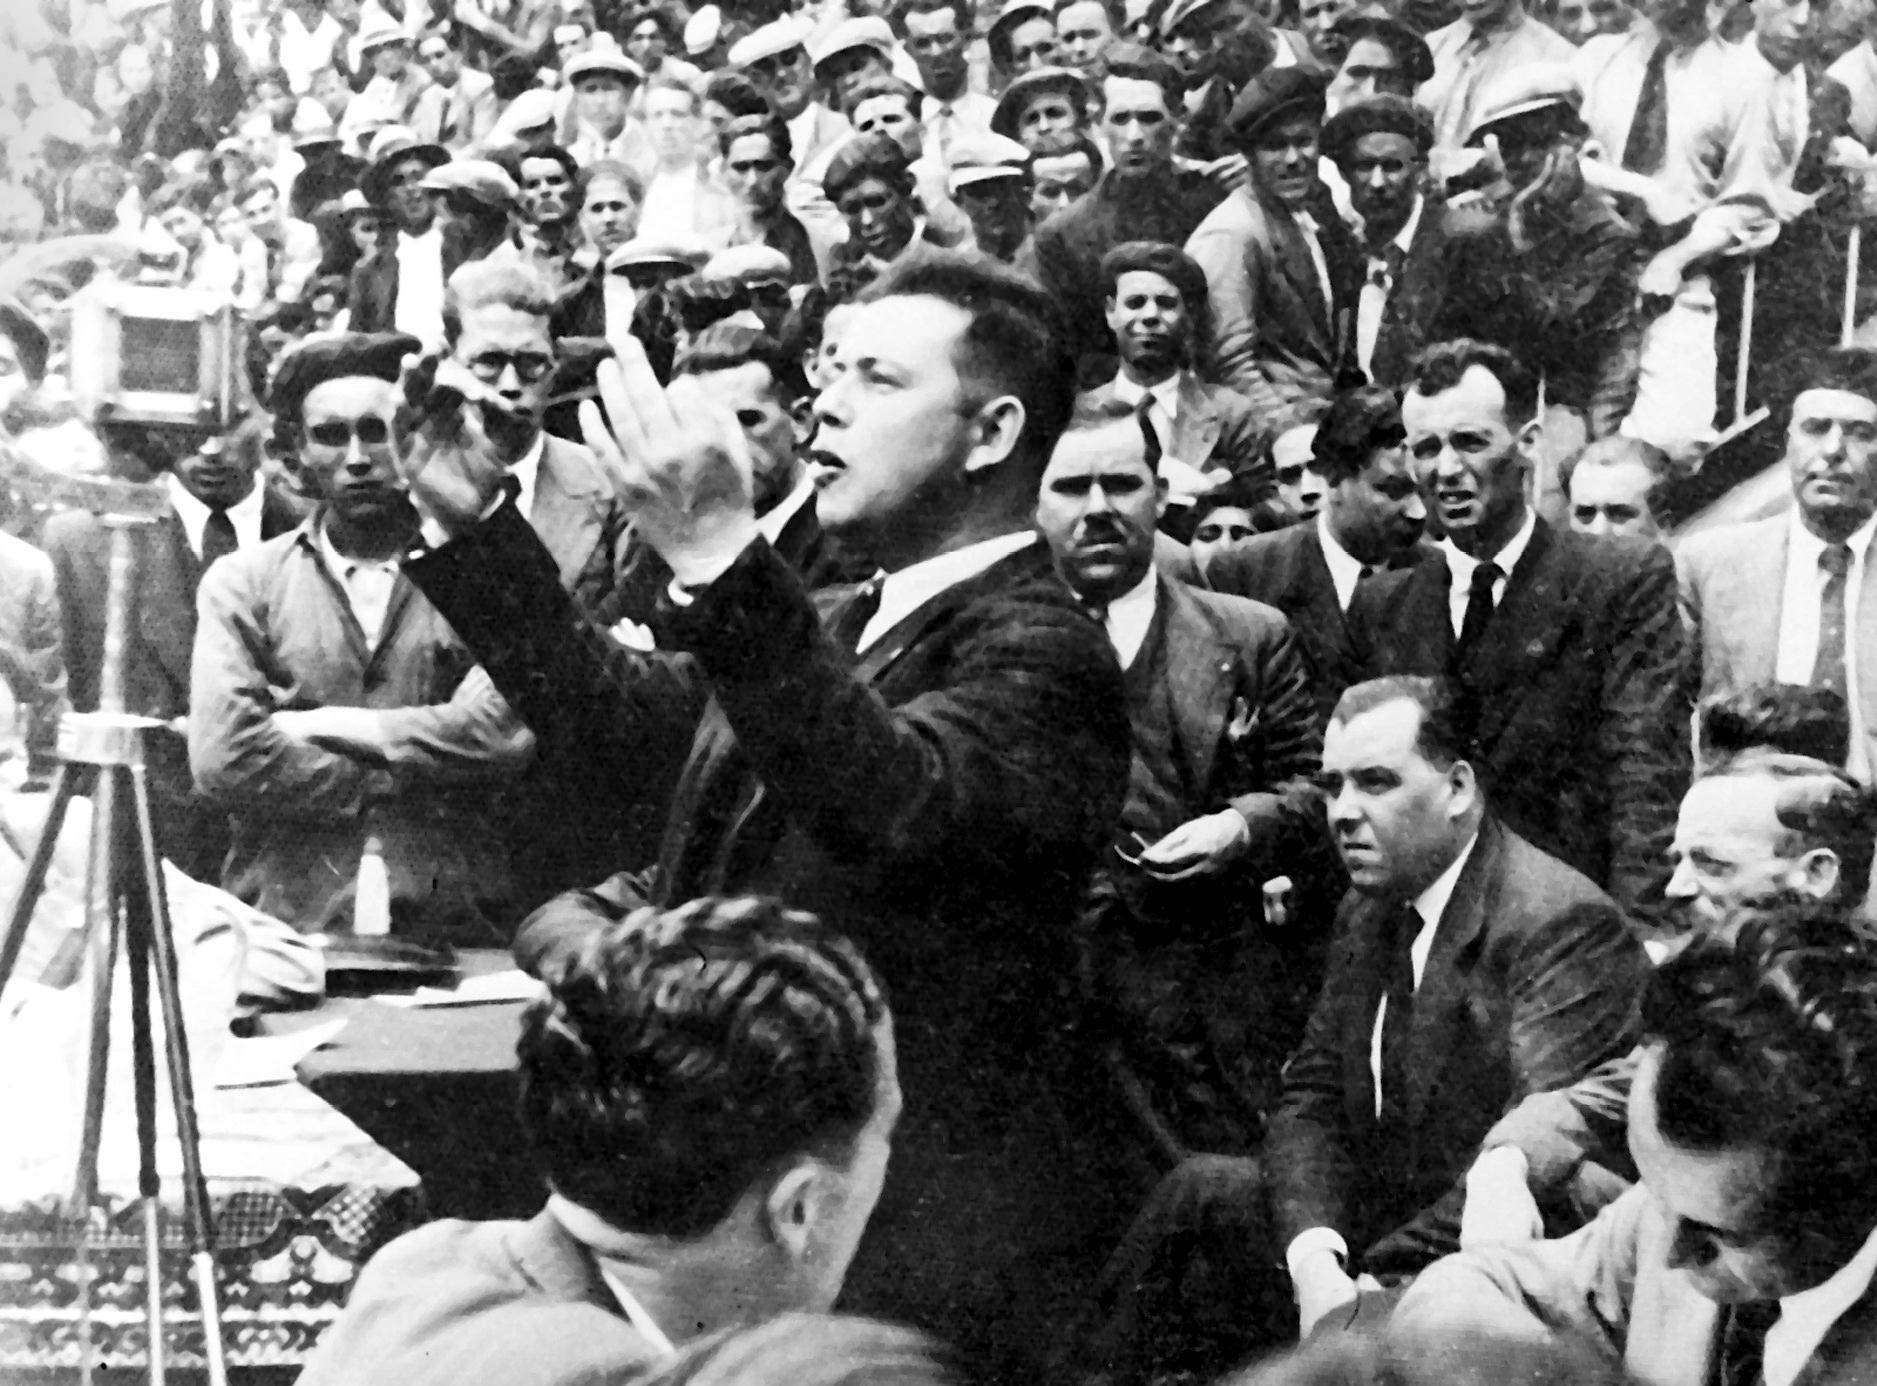 Vicente Ballester Tinoco a la Plaça de Toros de Cadis (24 de maig de 1936)